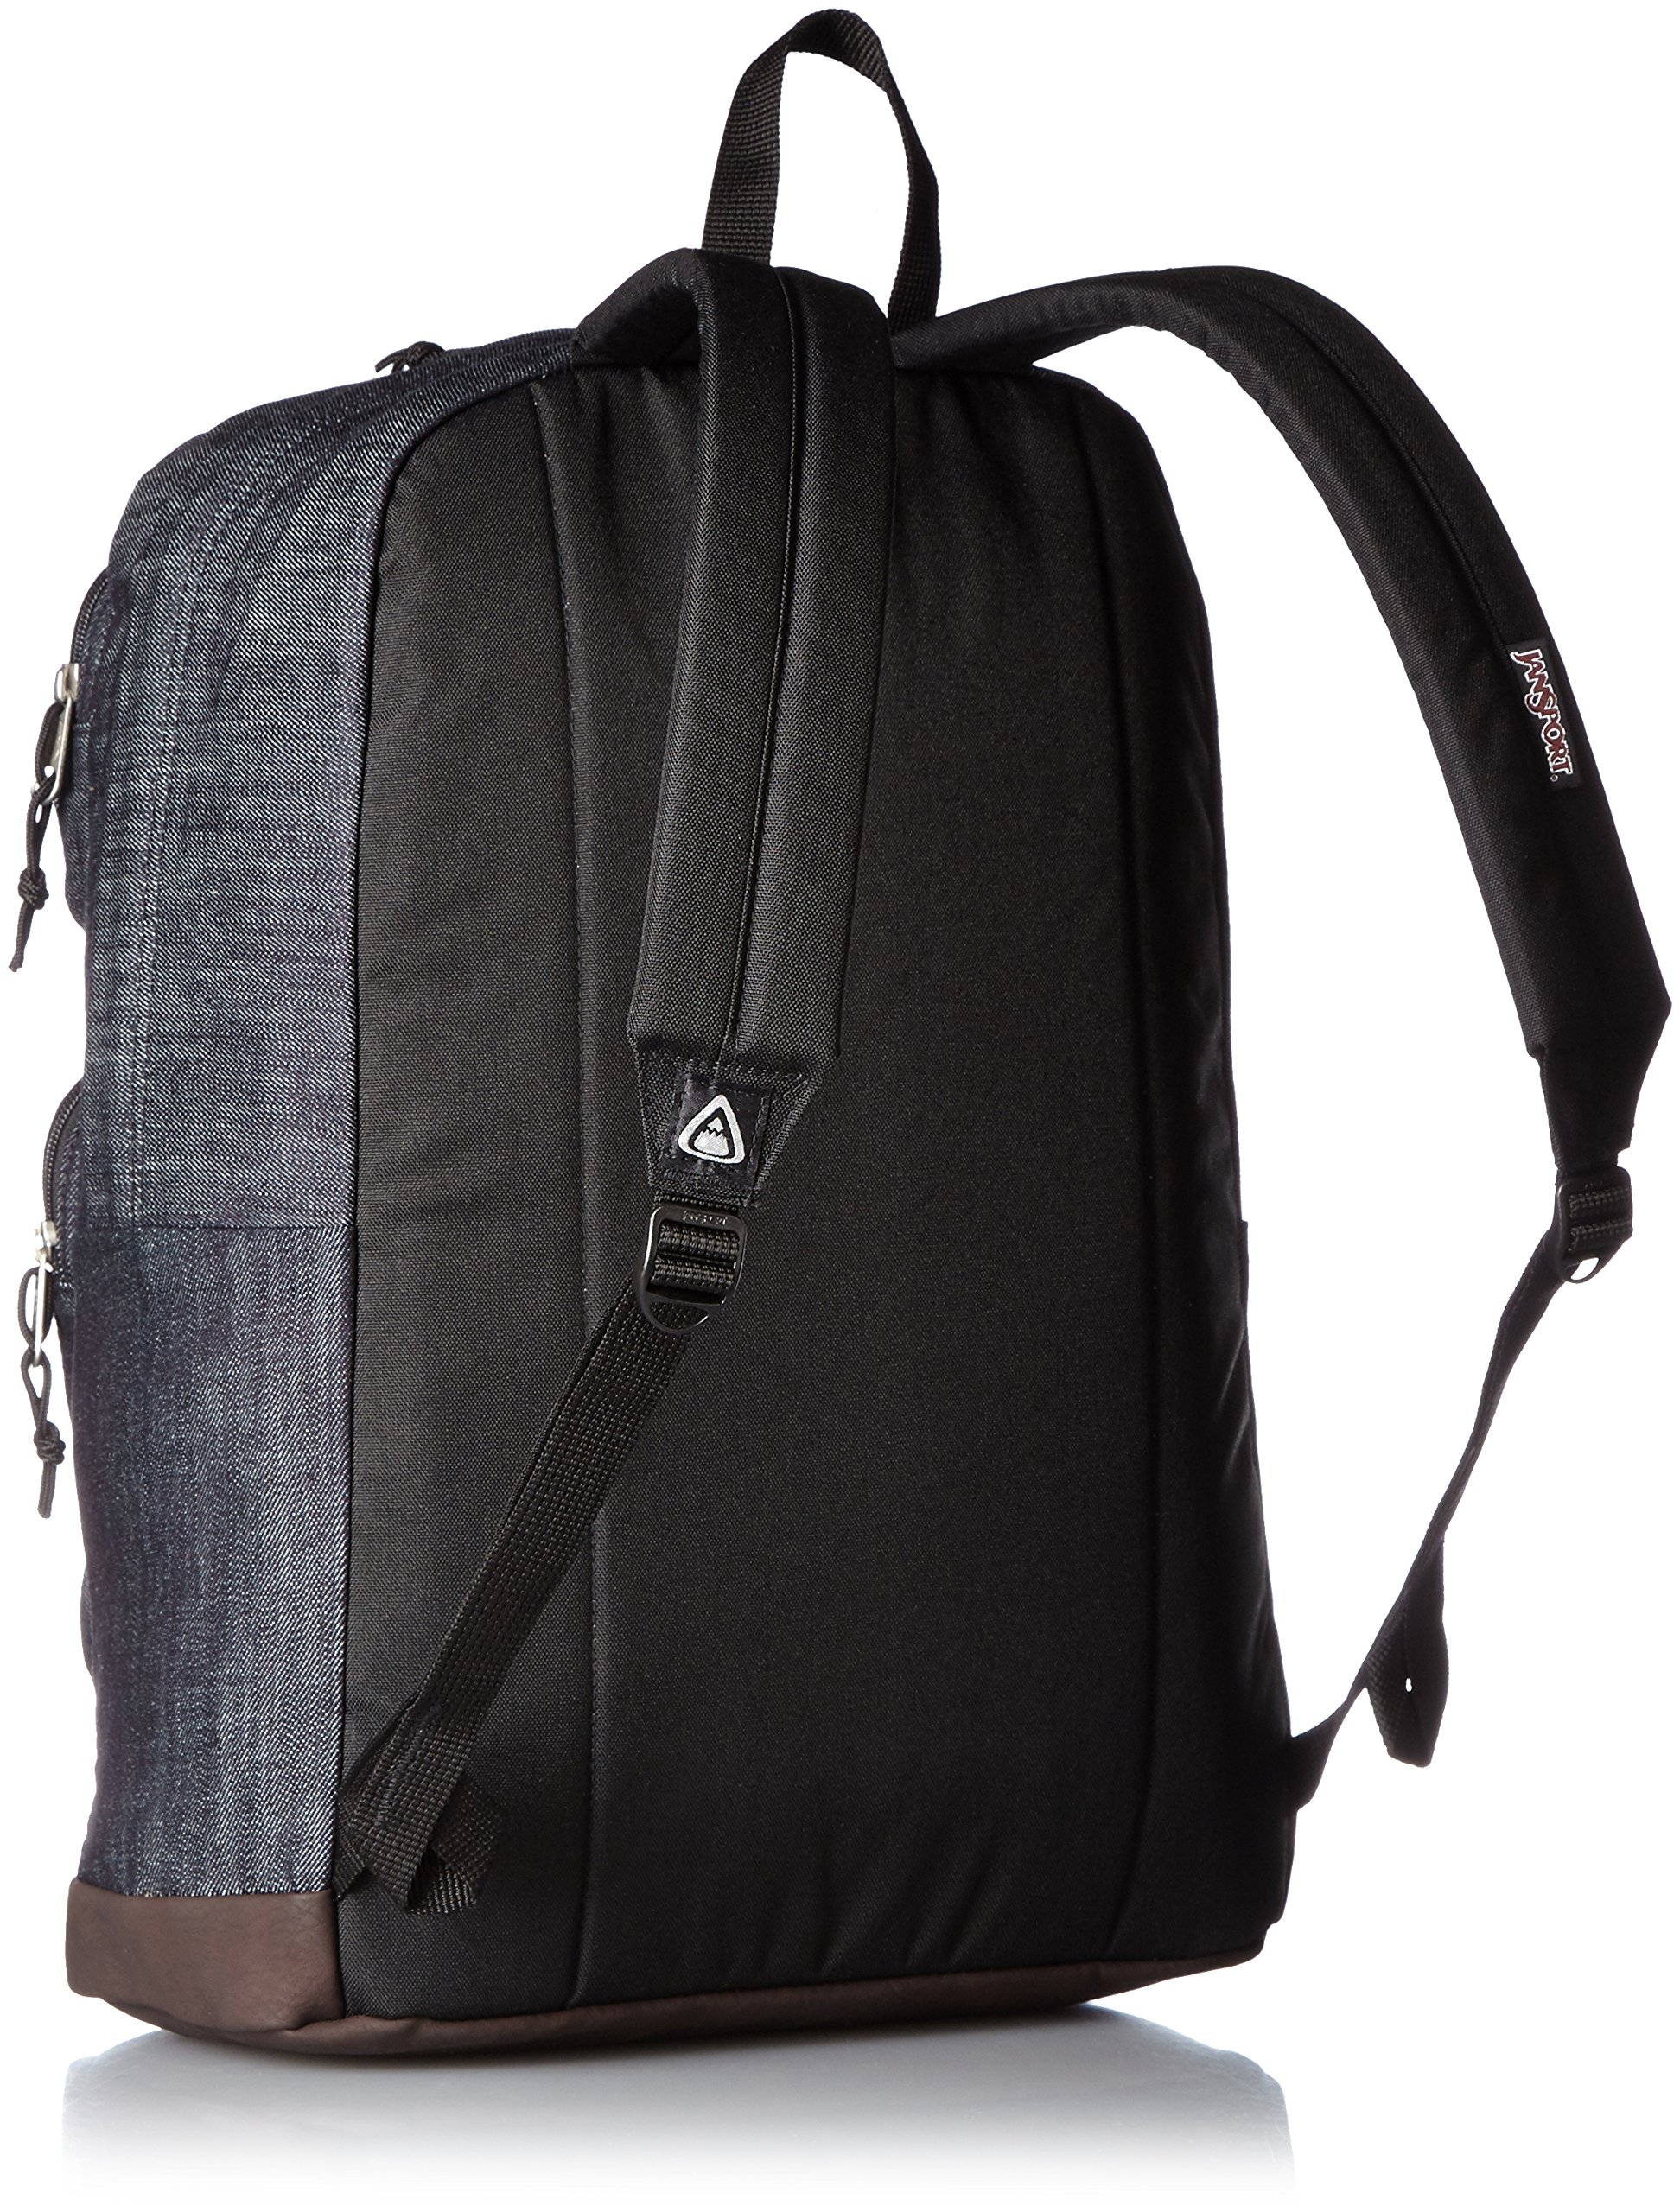 JanSport Houston Laptop Backpack- Discontinued Colors (Blue Denim - Expressions) by JanSport (Image #2)